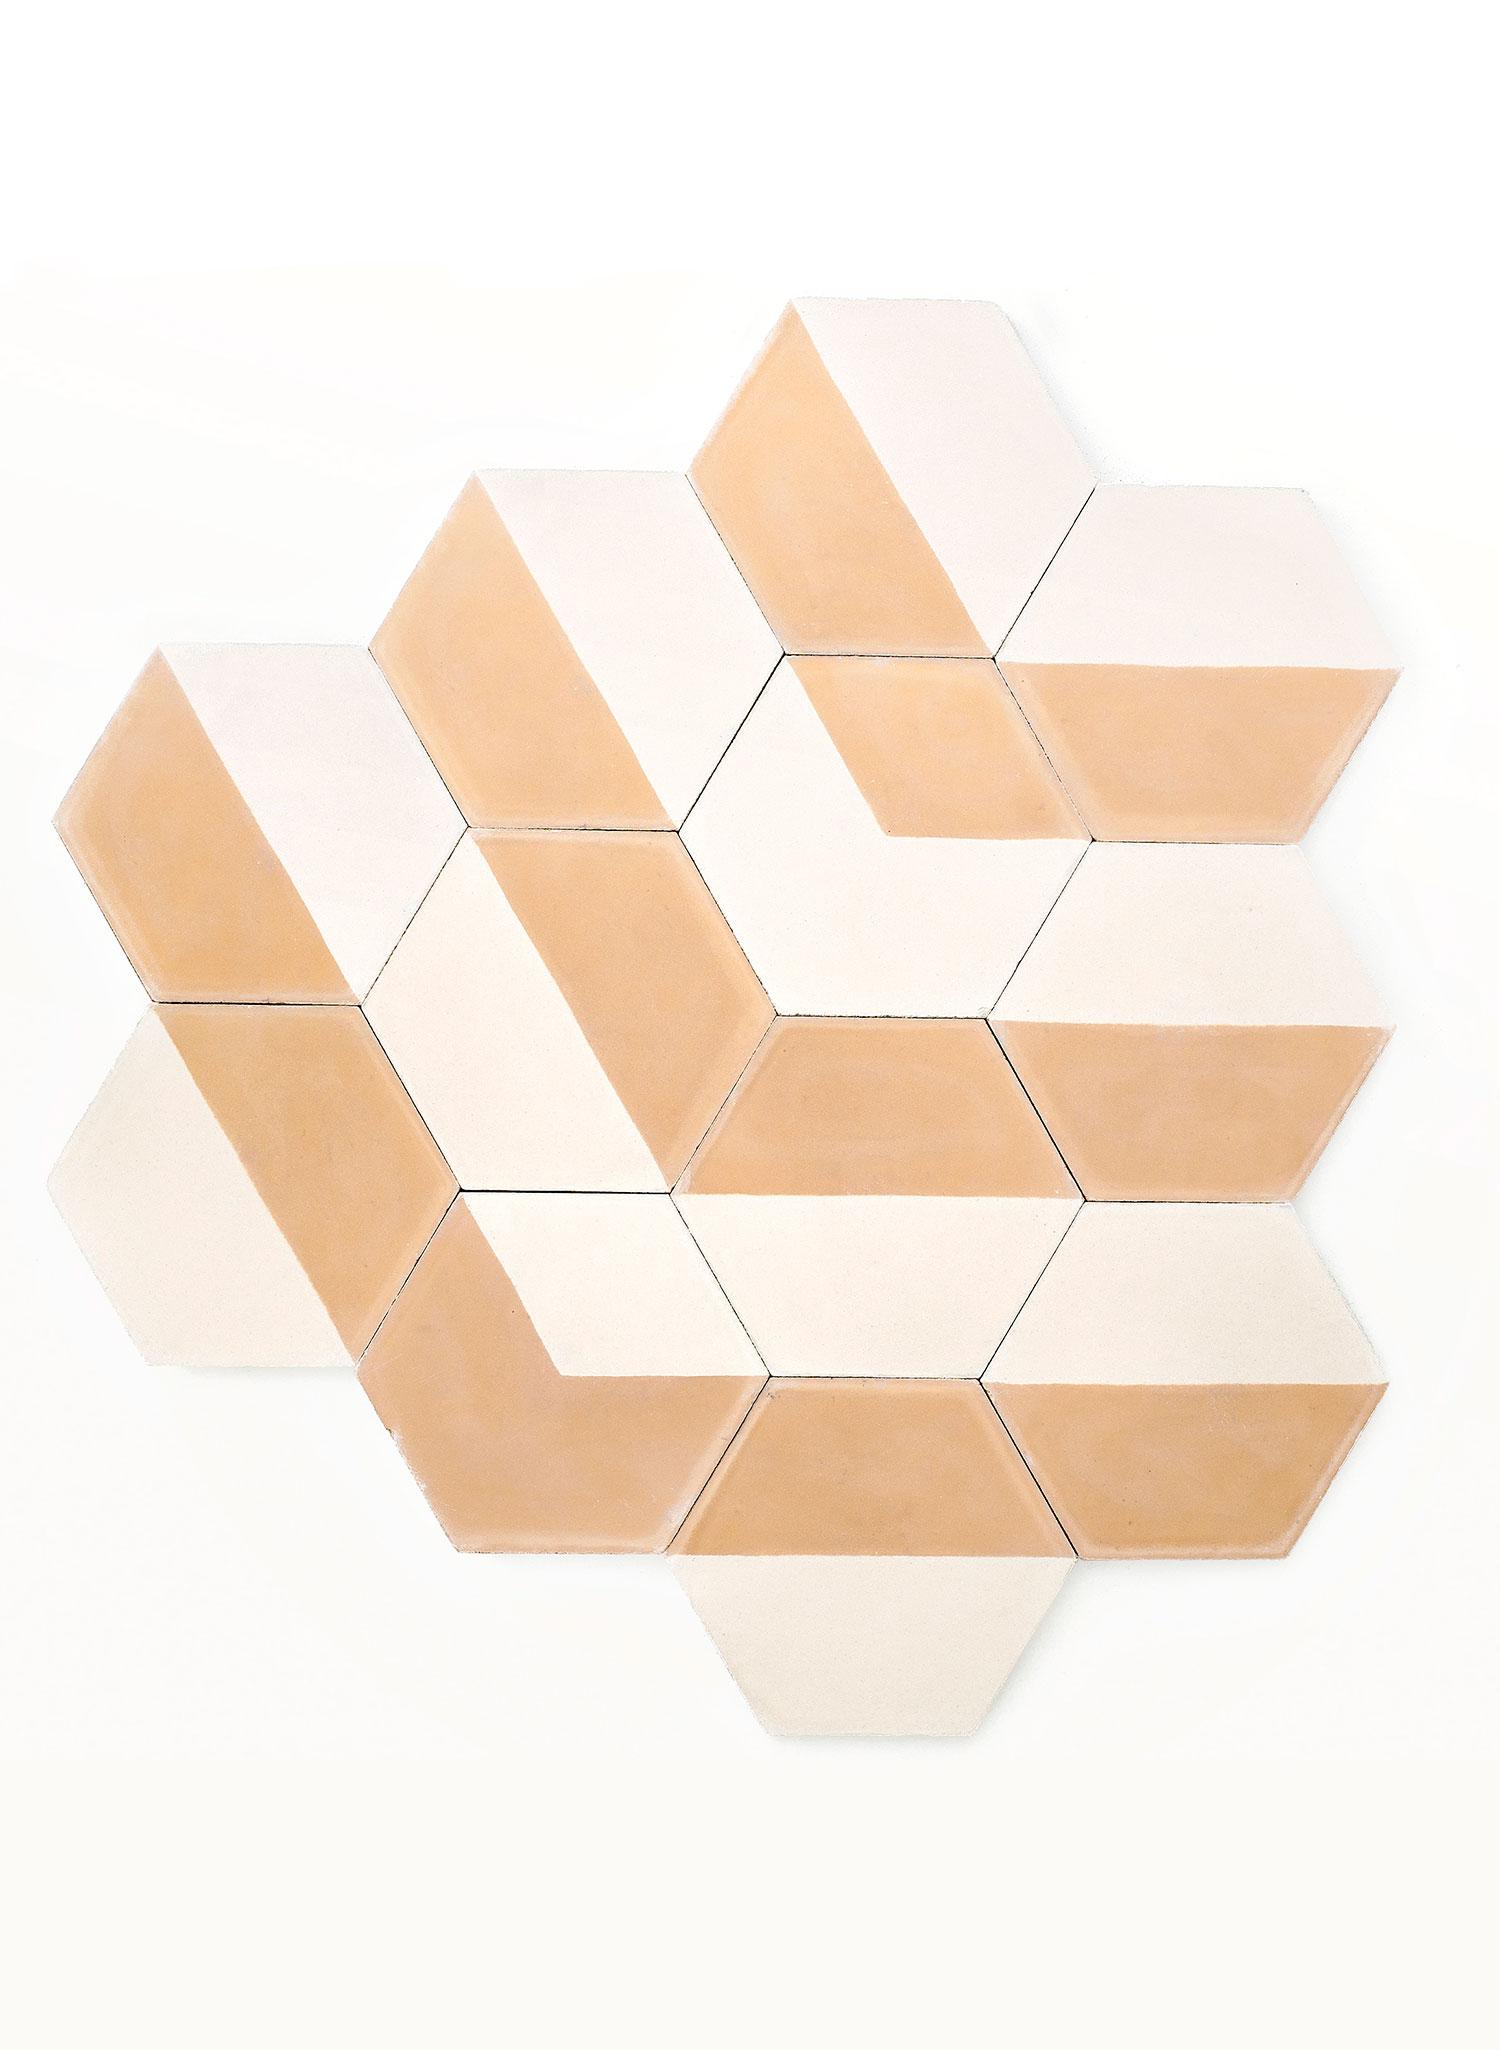 GDT2 Tile Pattern by Glen Baghurst, Salone Satellite 2016 | #MILANTRACE2016